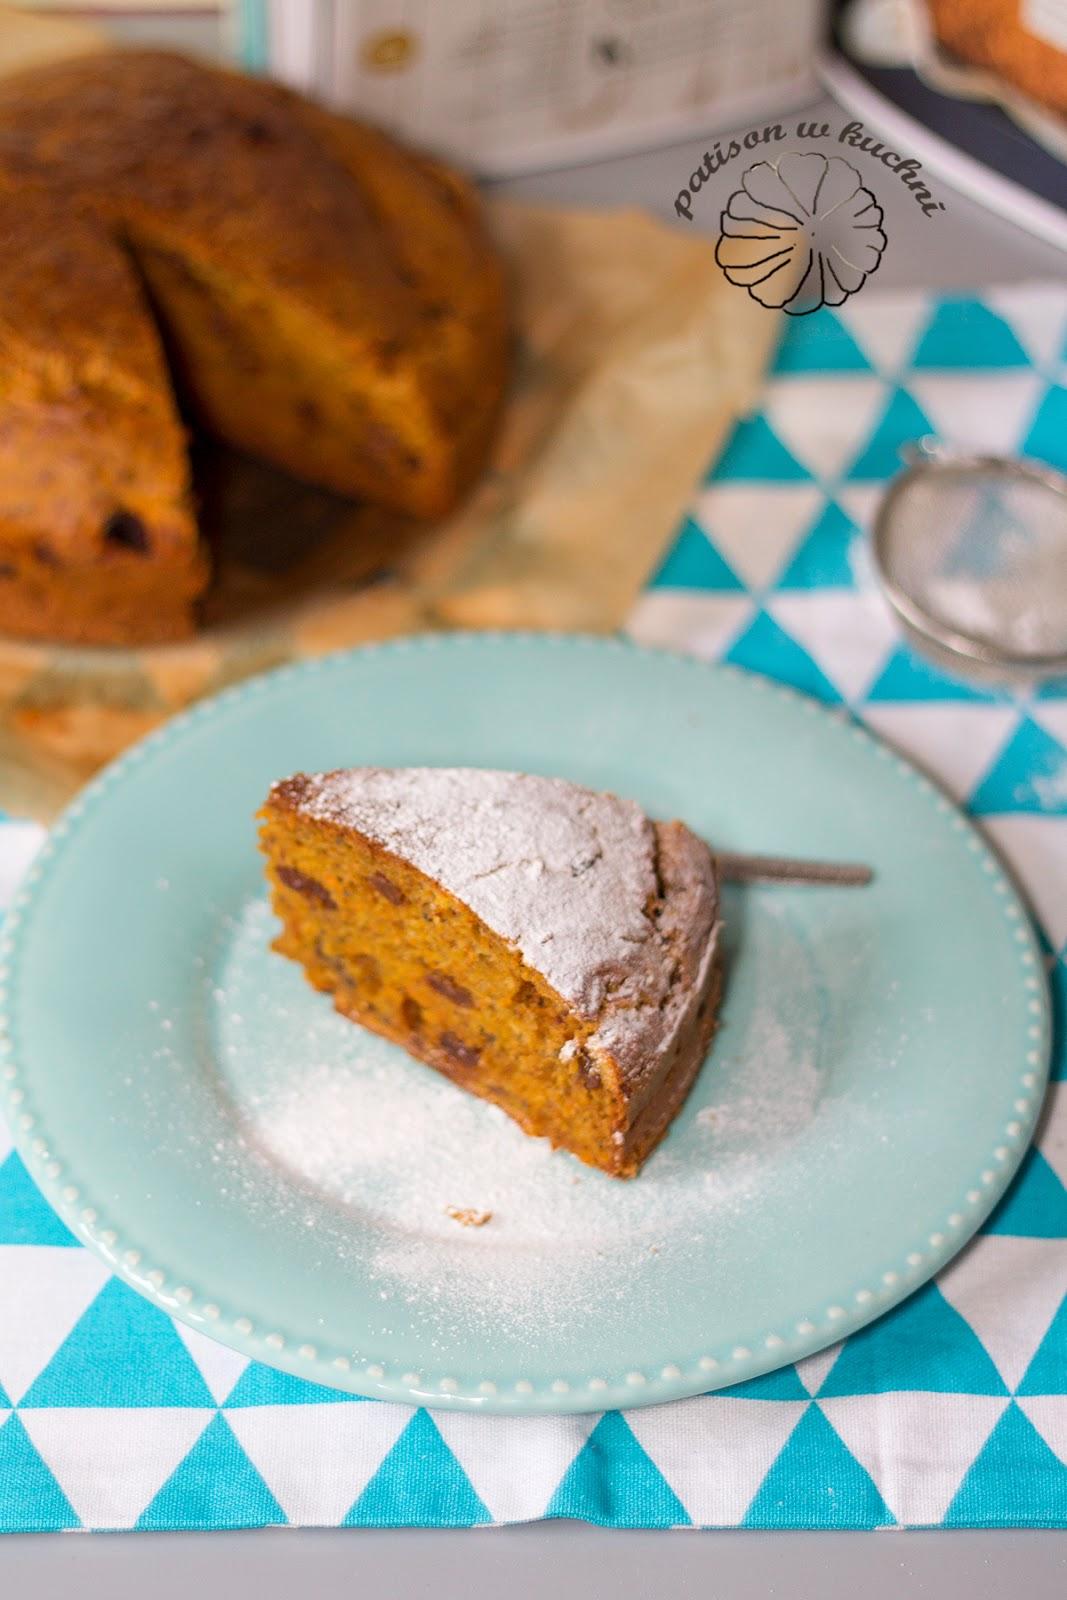 Ciasto marchewkowe. carrot cake